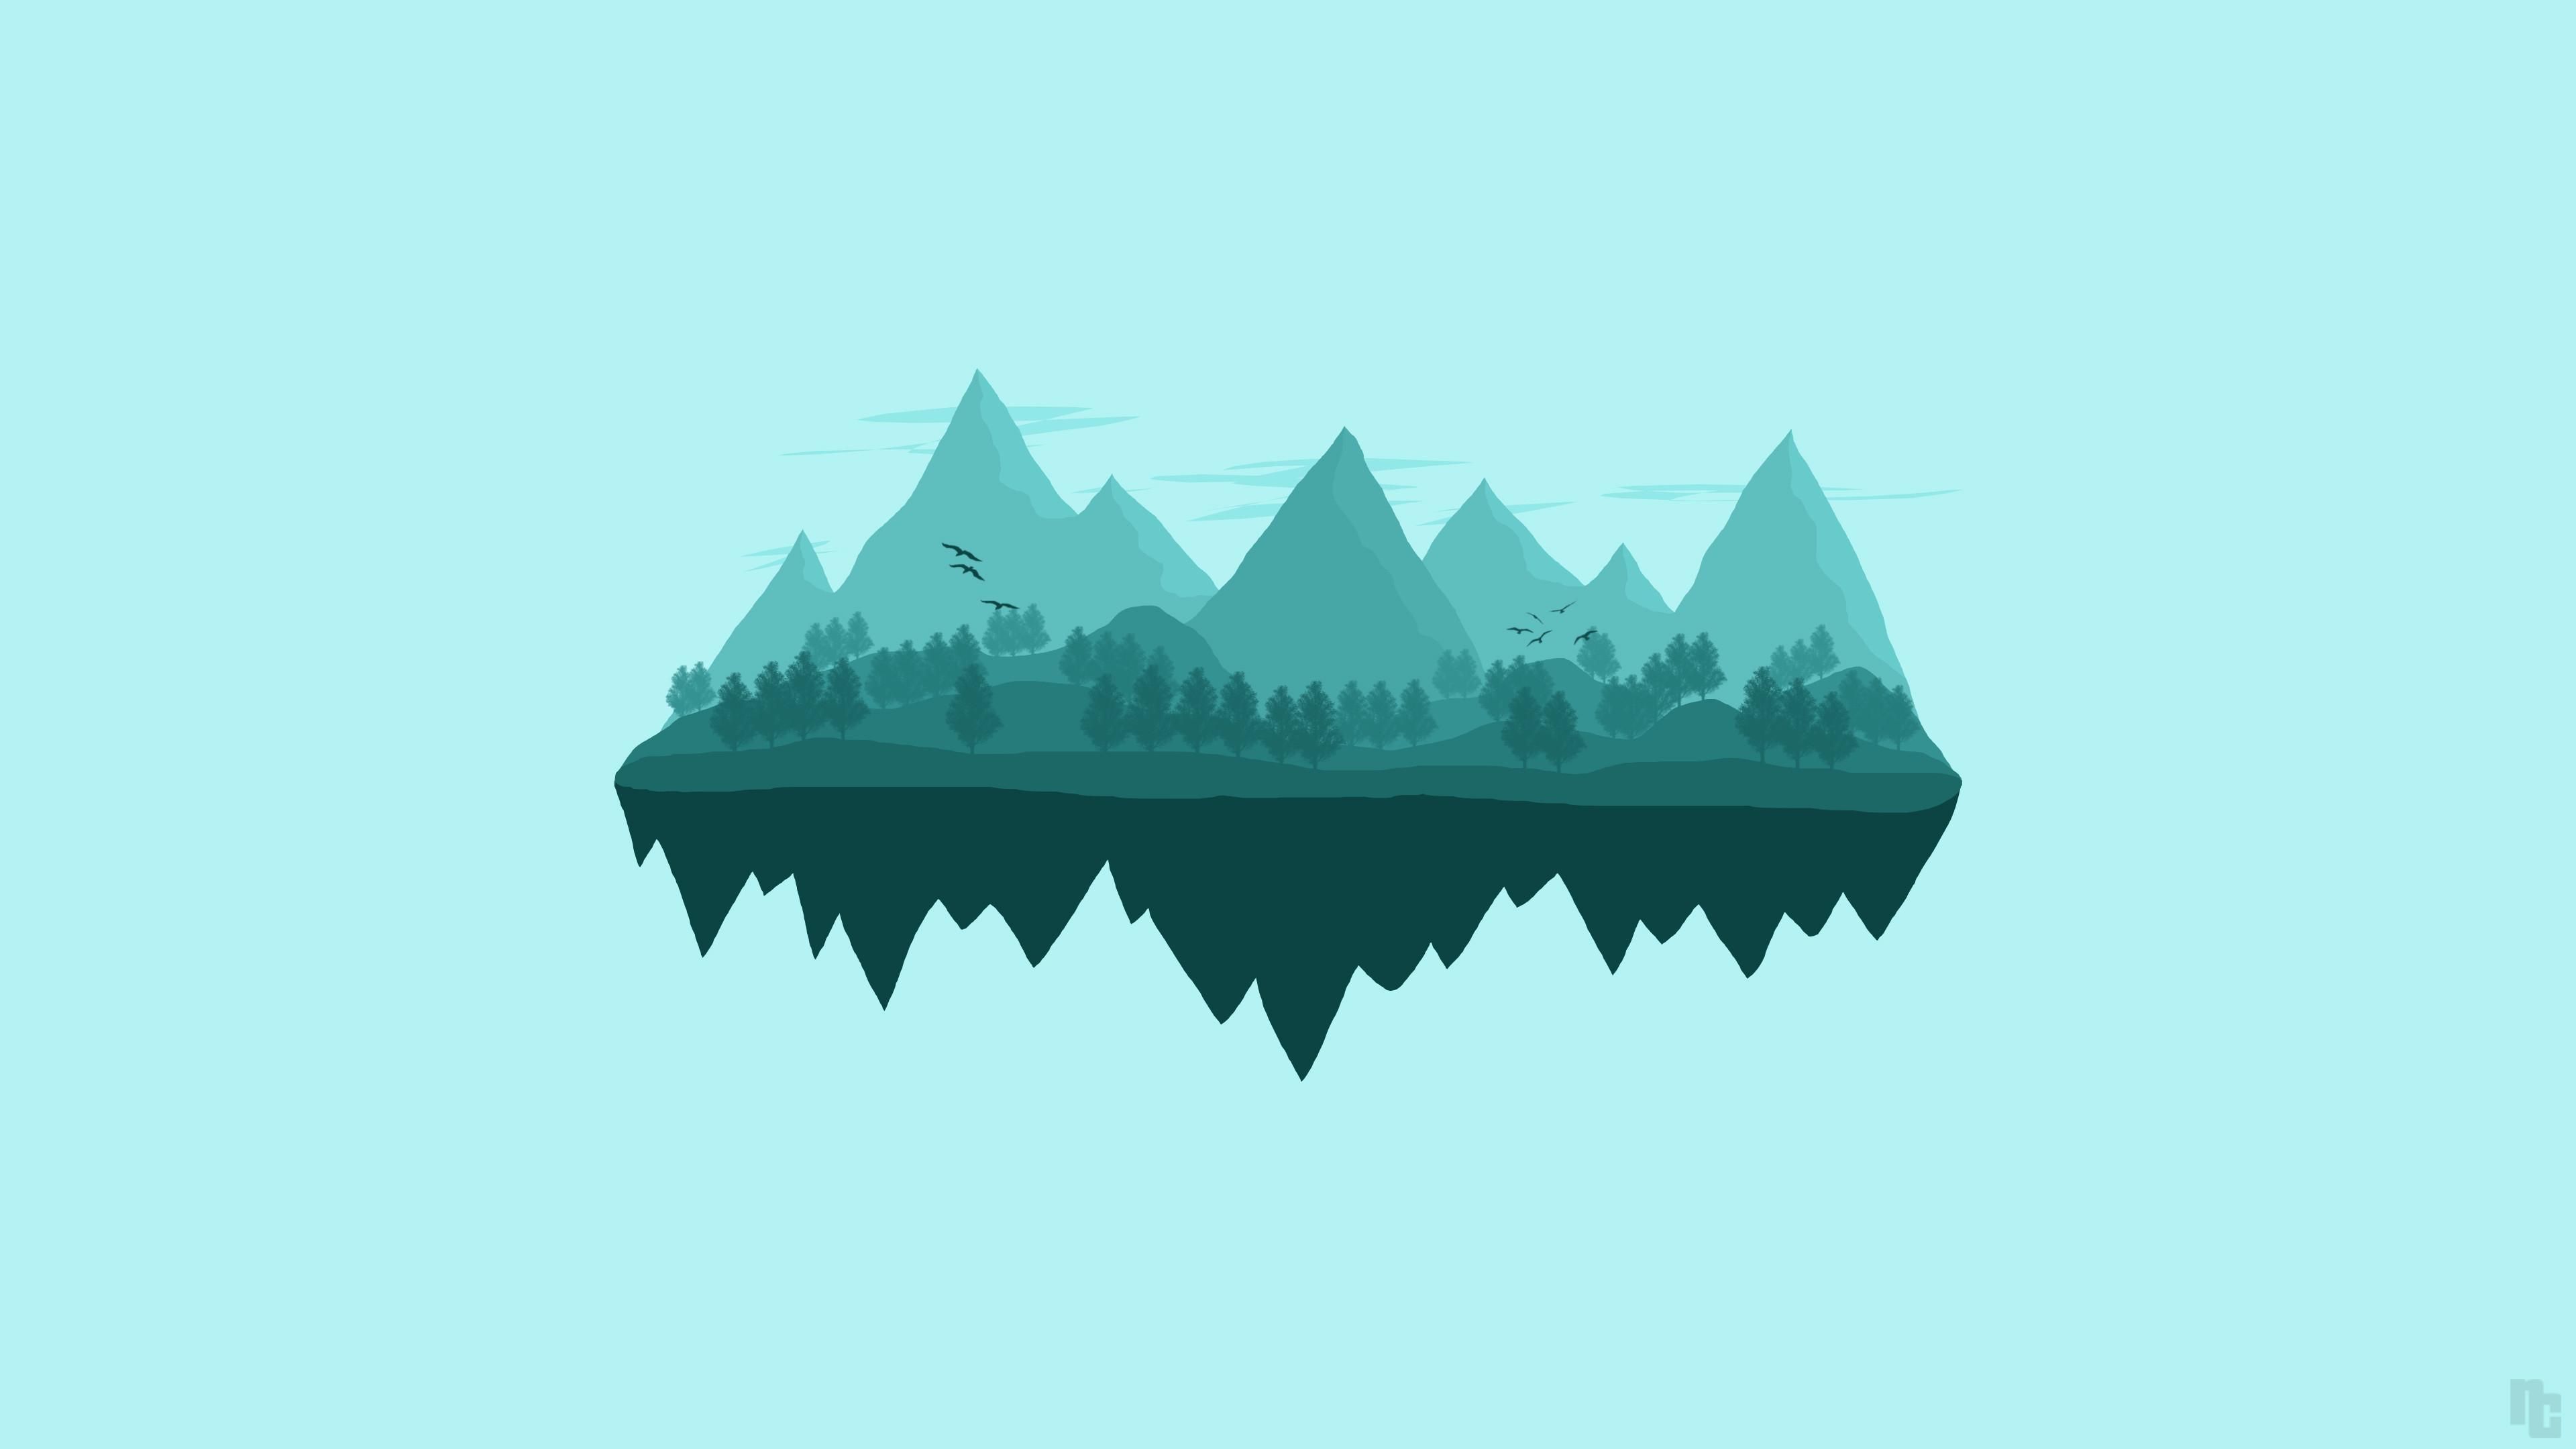 Minimalism Mountain Peak Full Hd Wallpaper: 4K Minimalist Wallpaper (67+ Images